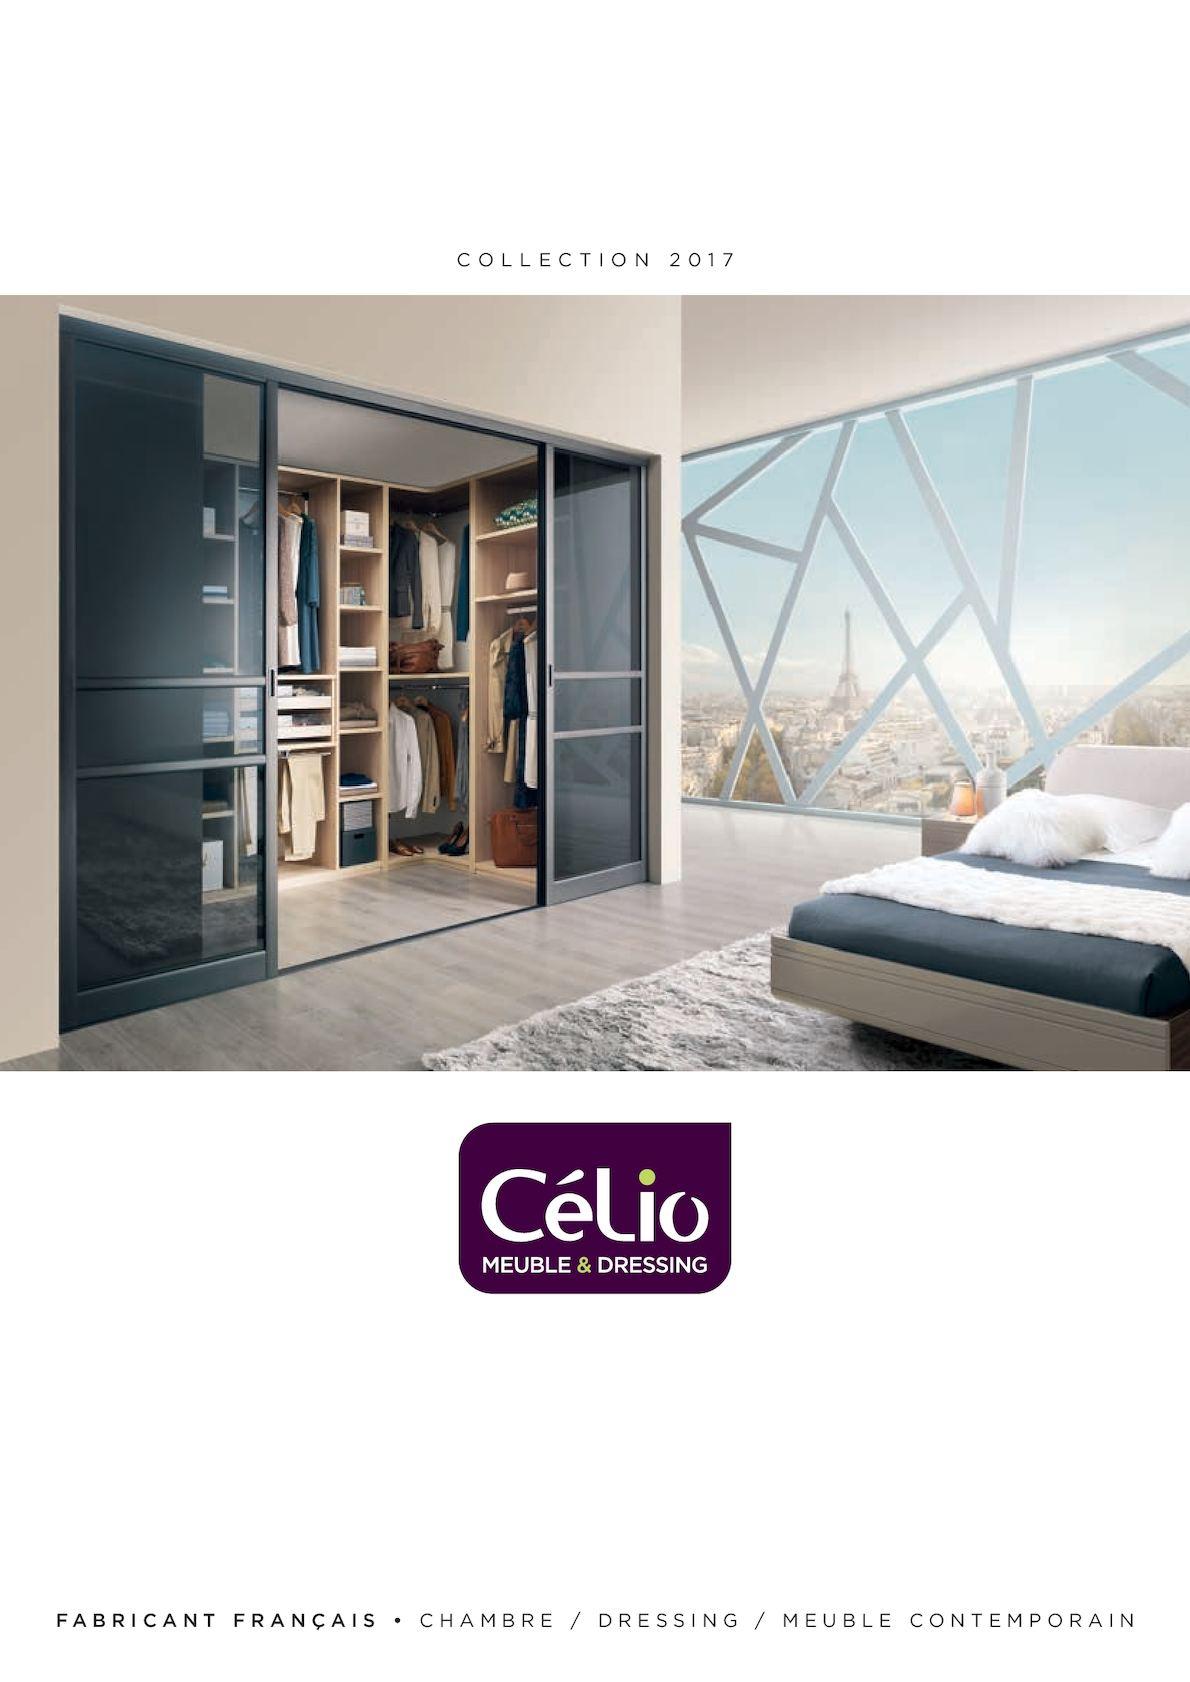 Dressing 30 Cm Profondeur calaméo - celio catalogue 2017 2018